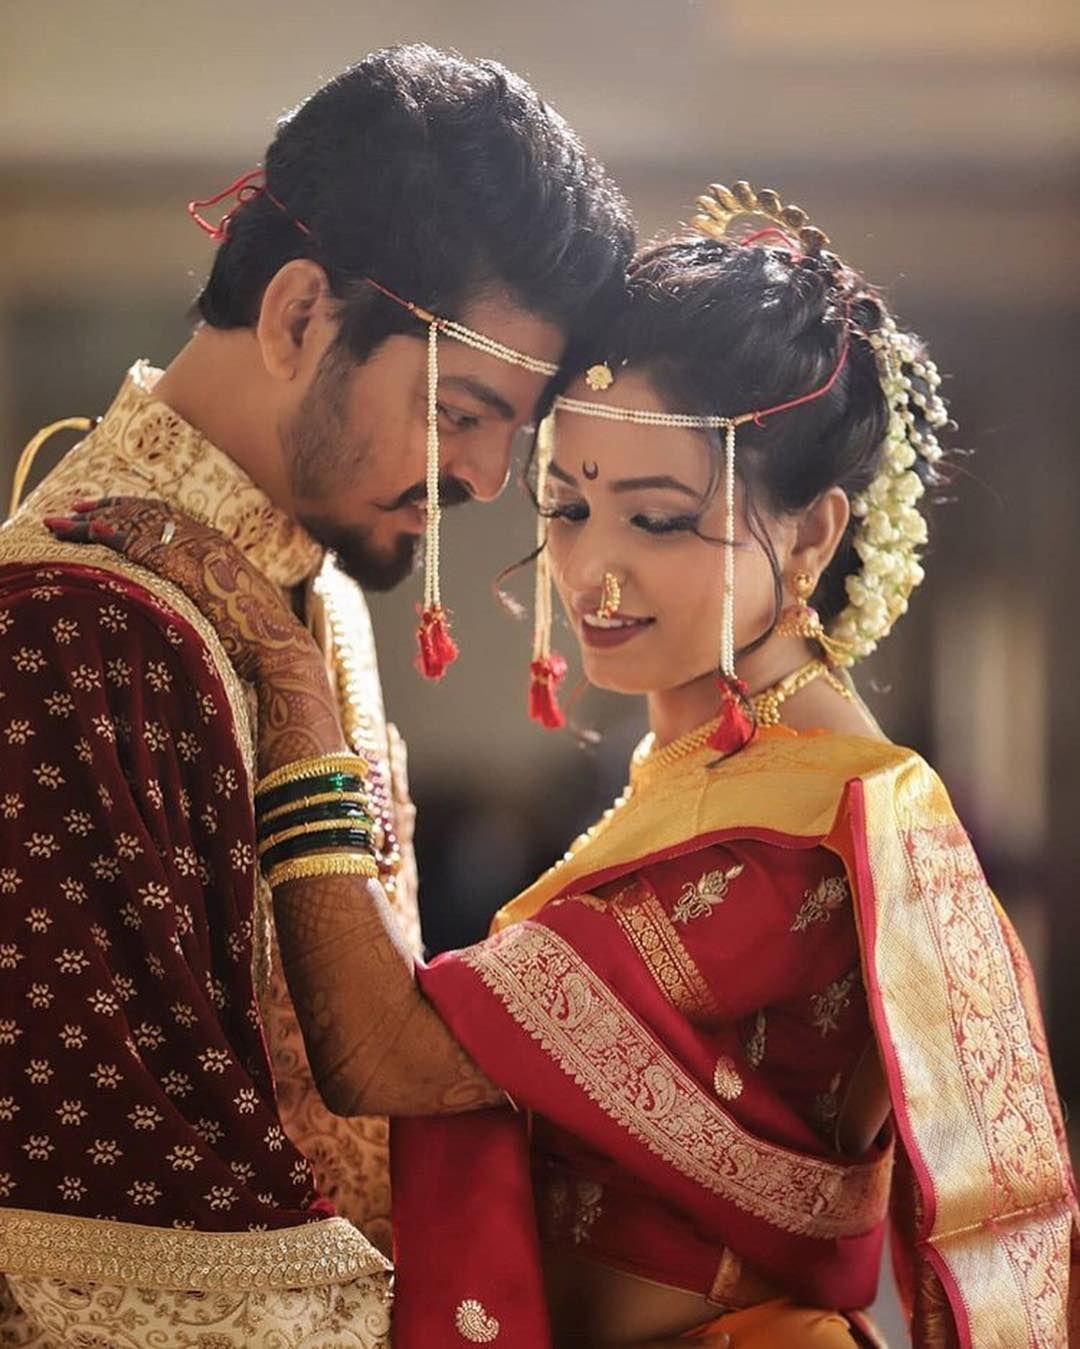 Maharashtrian Wedding Use Hashtag Maha Indian Wedding Photography Poses Indian Wedding Photography Couples Wedding Couple Poses Photography